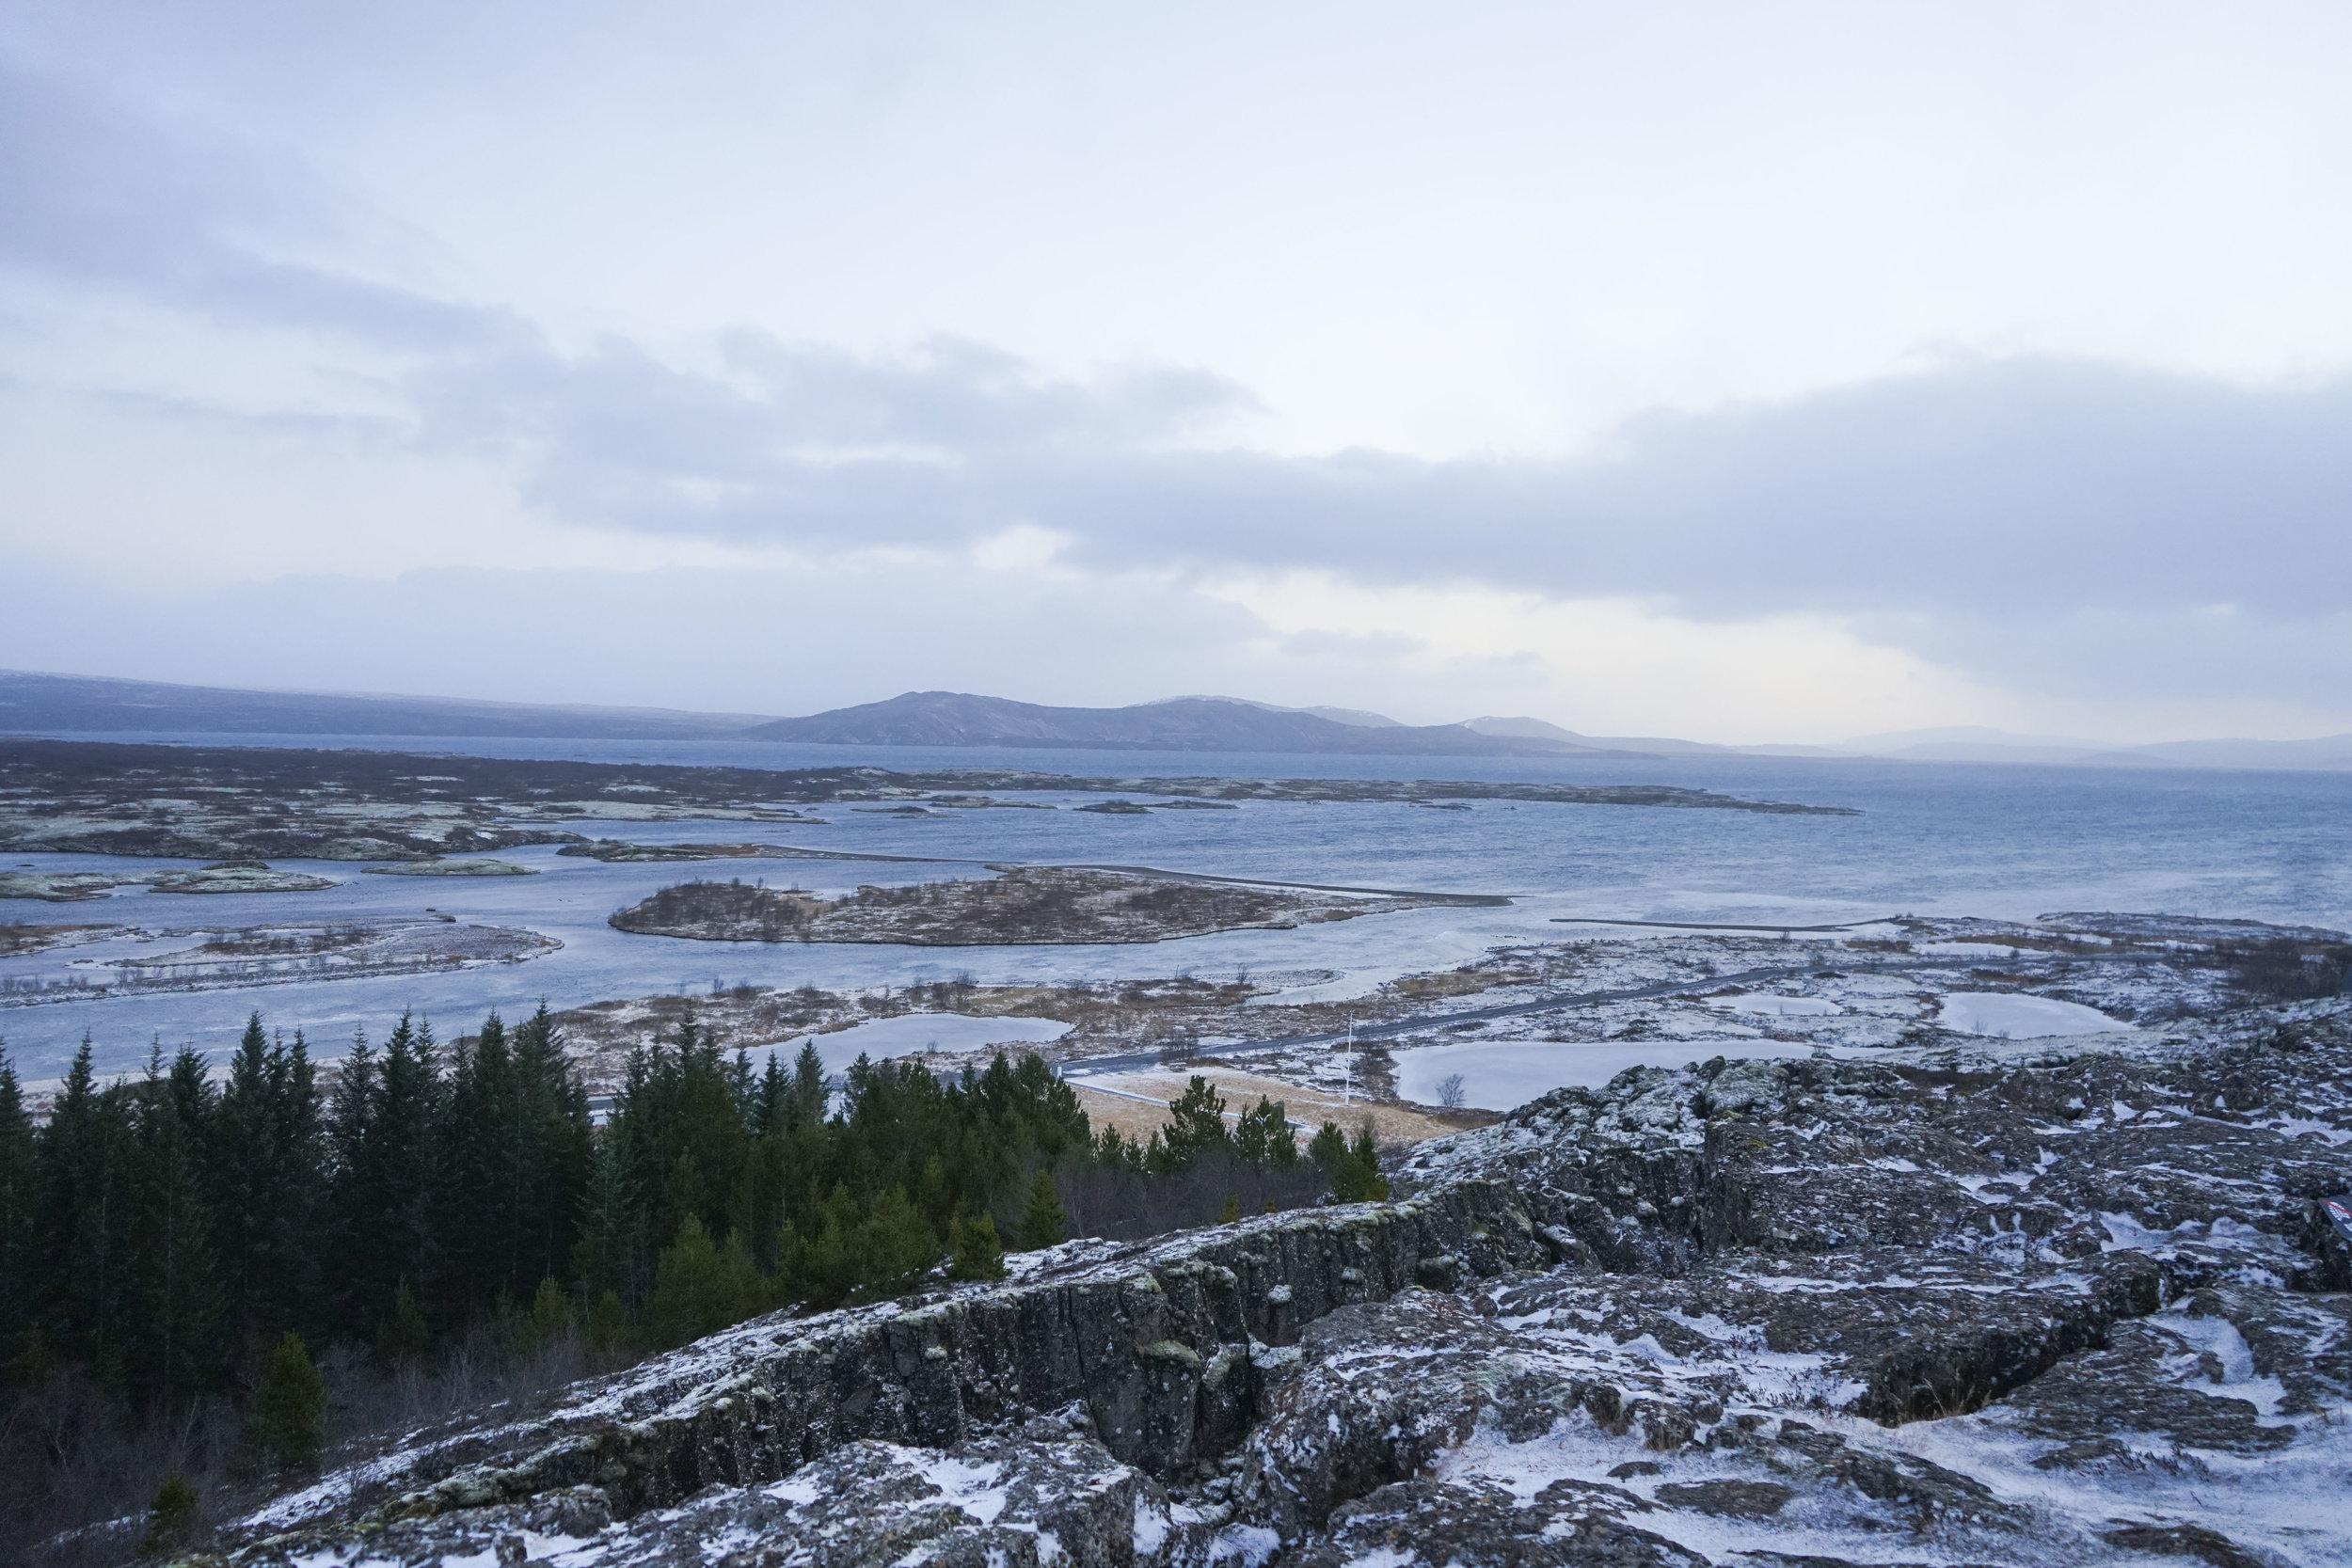 Krity S x Iceland 2018_51.jpg